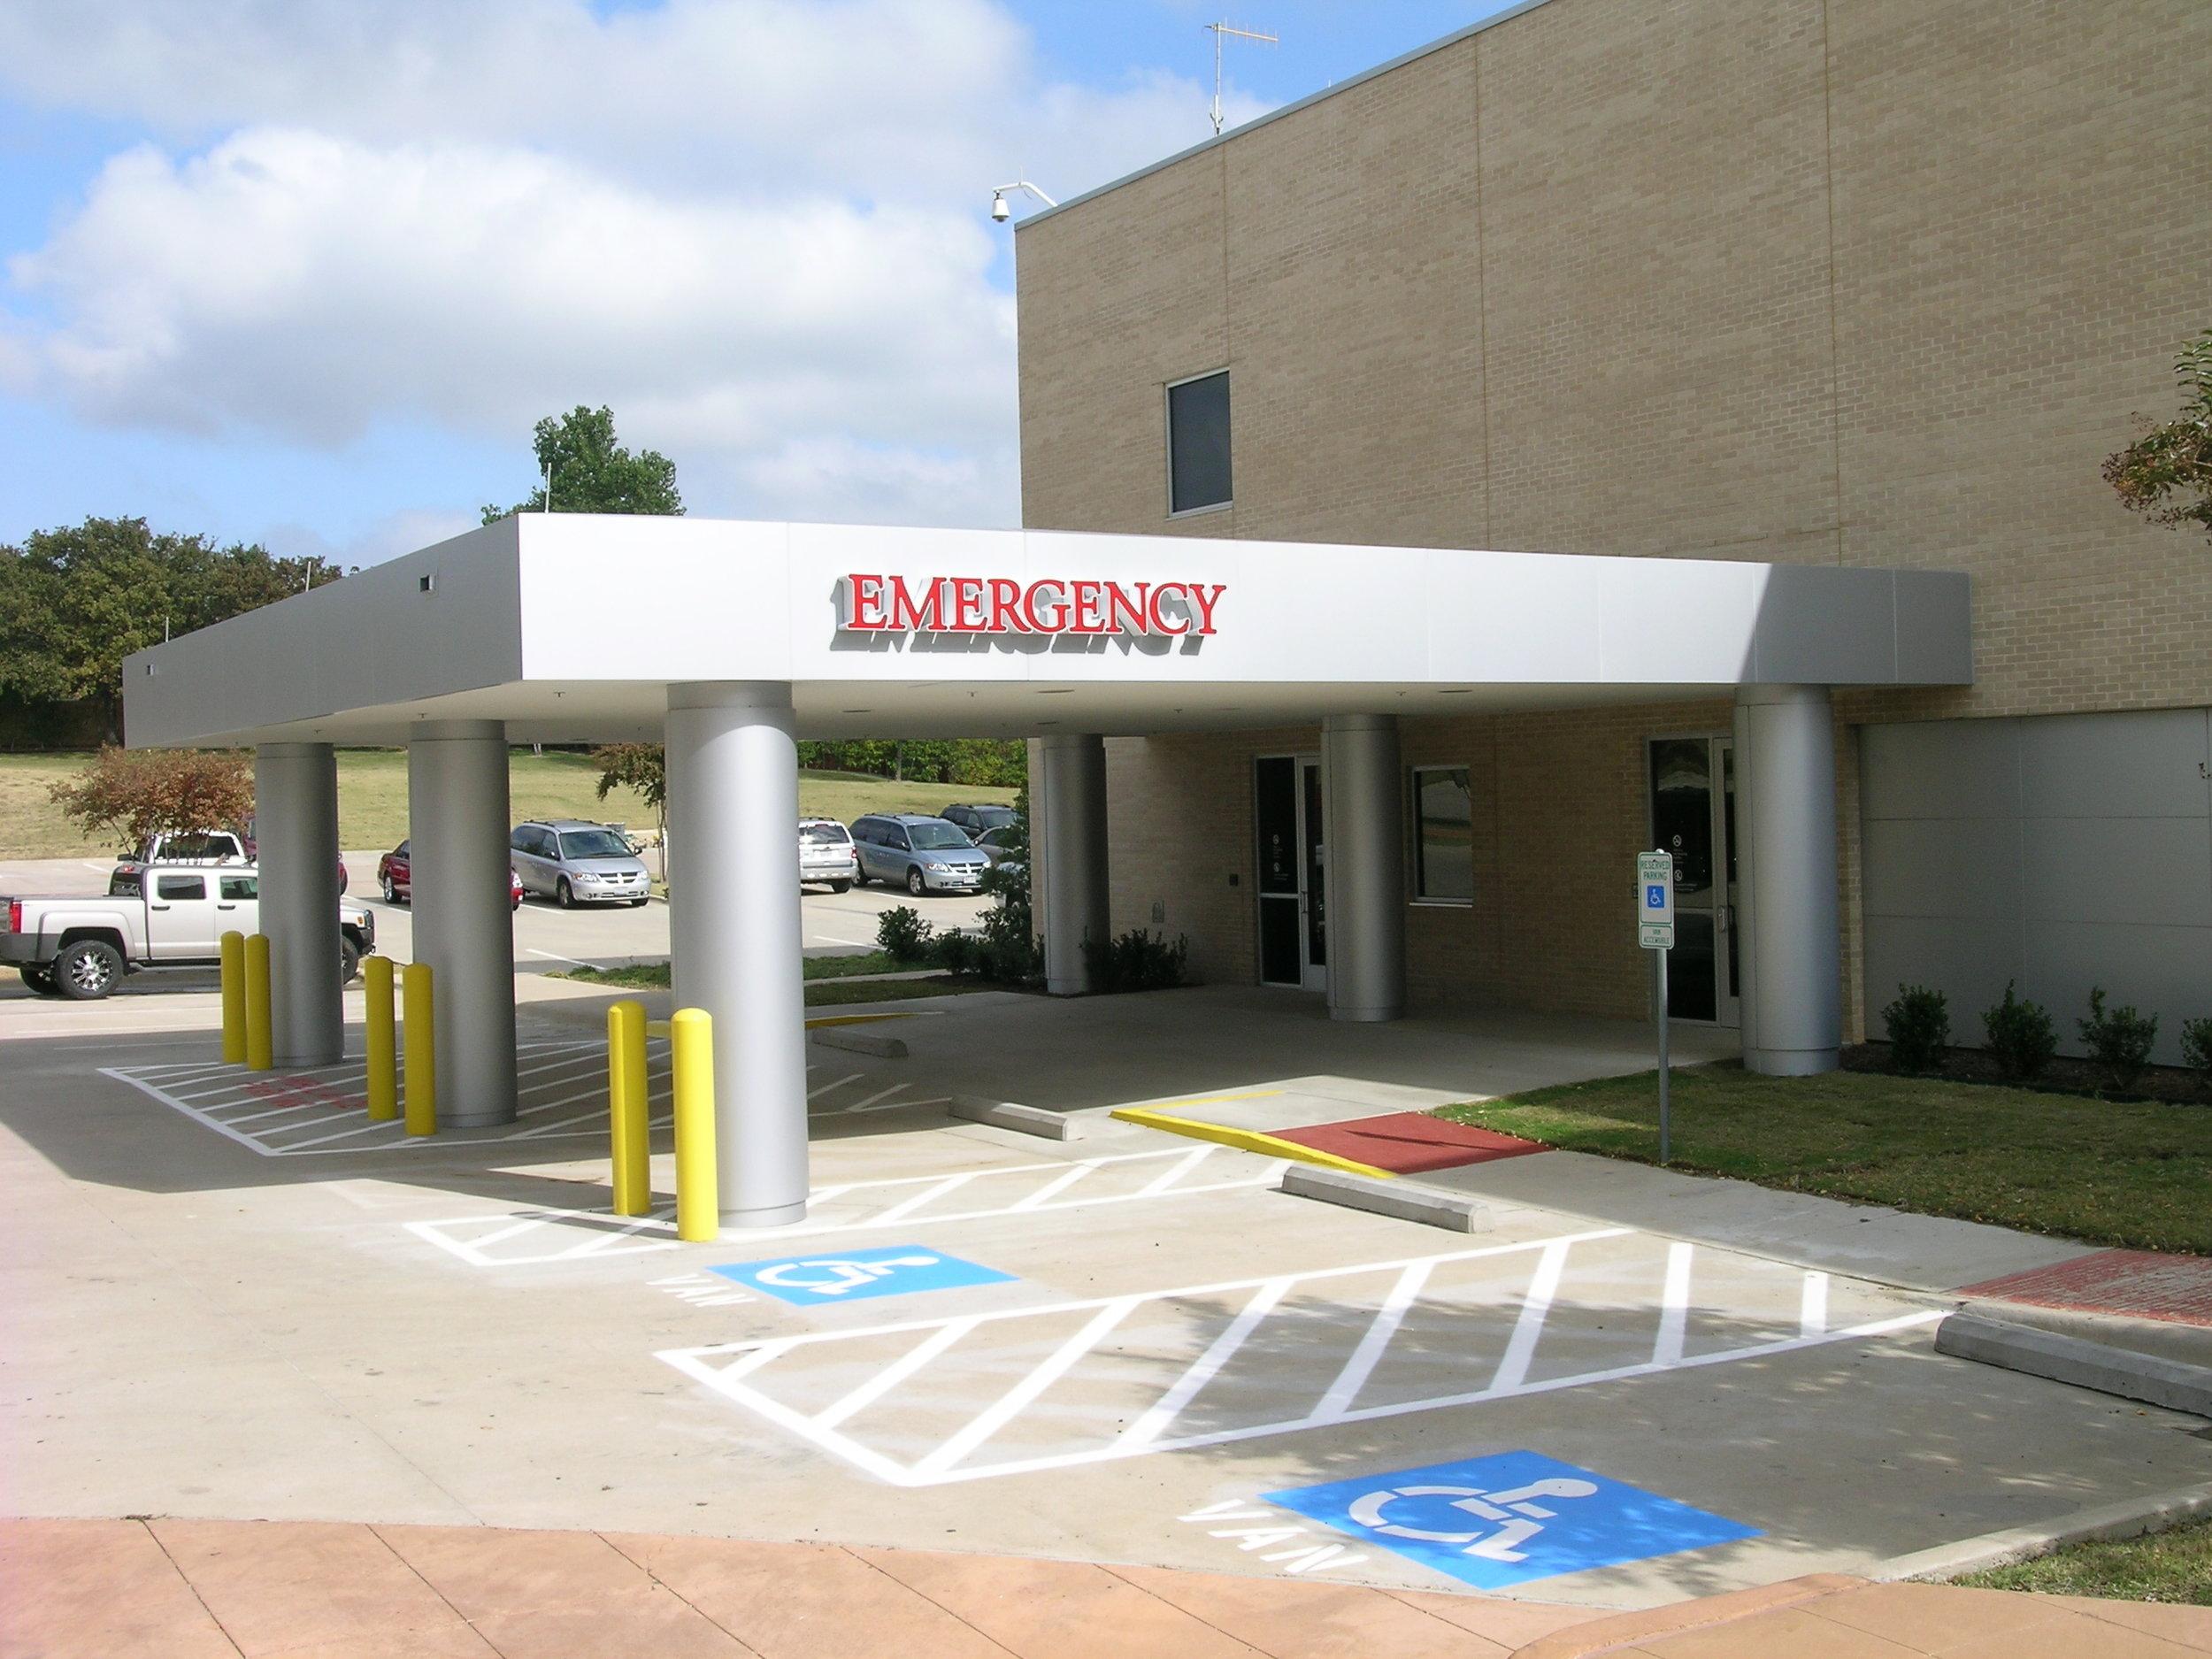 New Emergency Entrance Canopy.JPG